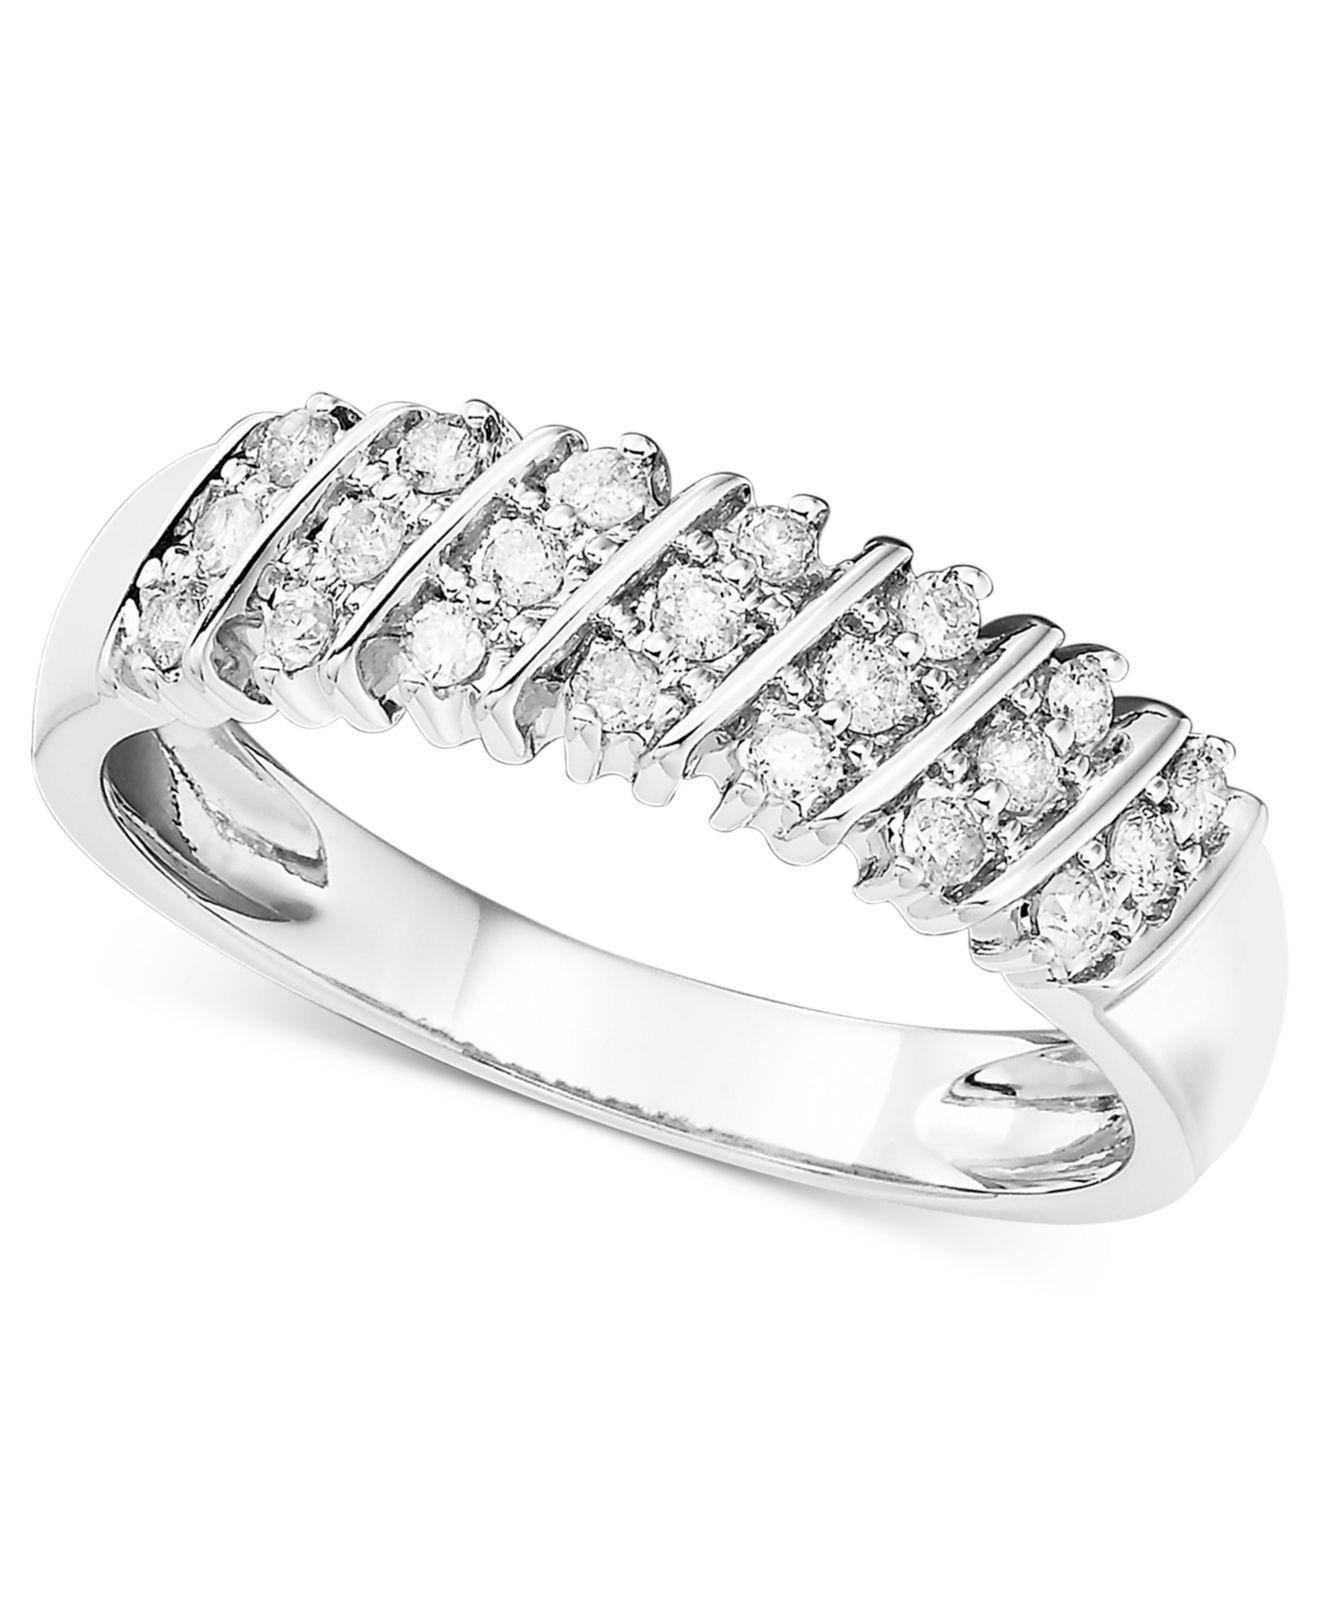 Macy's Diamond Engagement Ring And Wedding Band